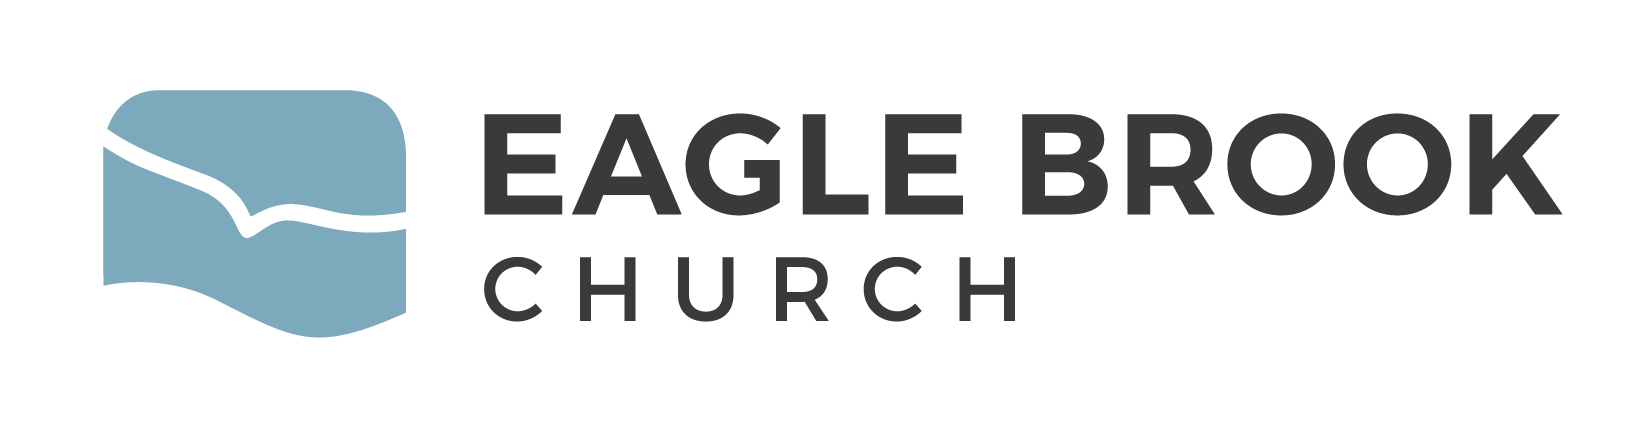 Eagle Brook Church - Spring Lake Park Campus